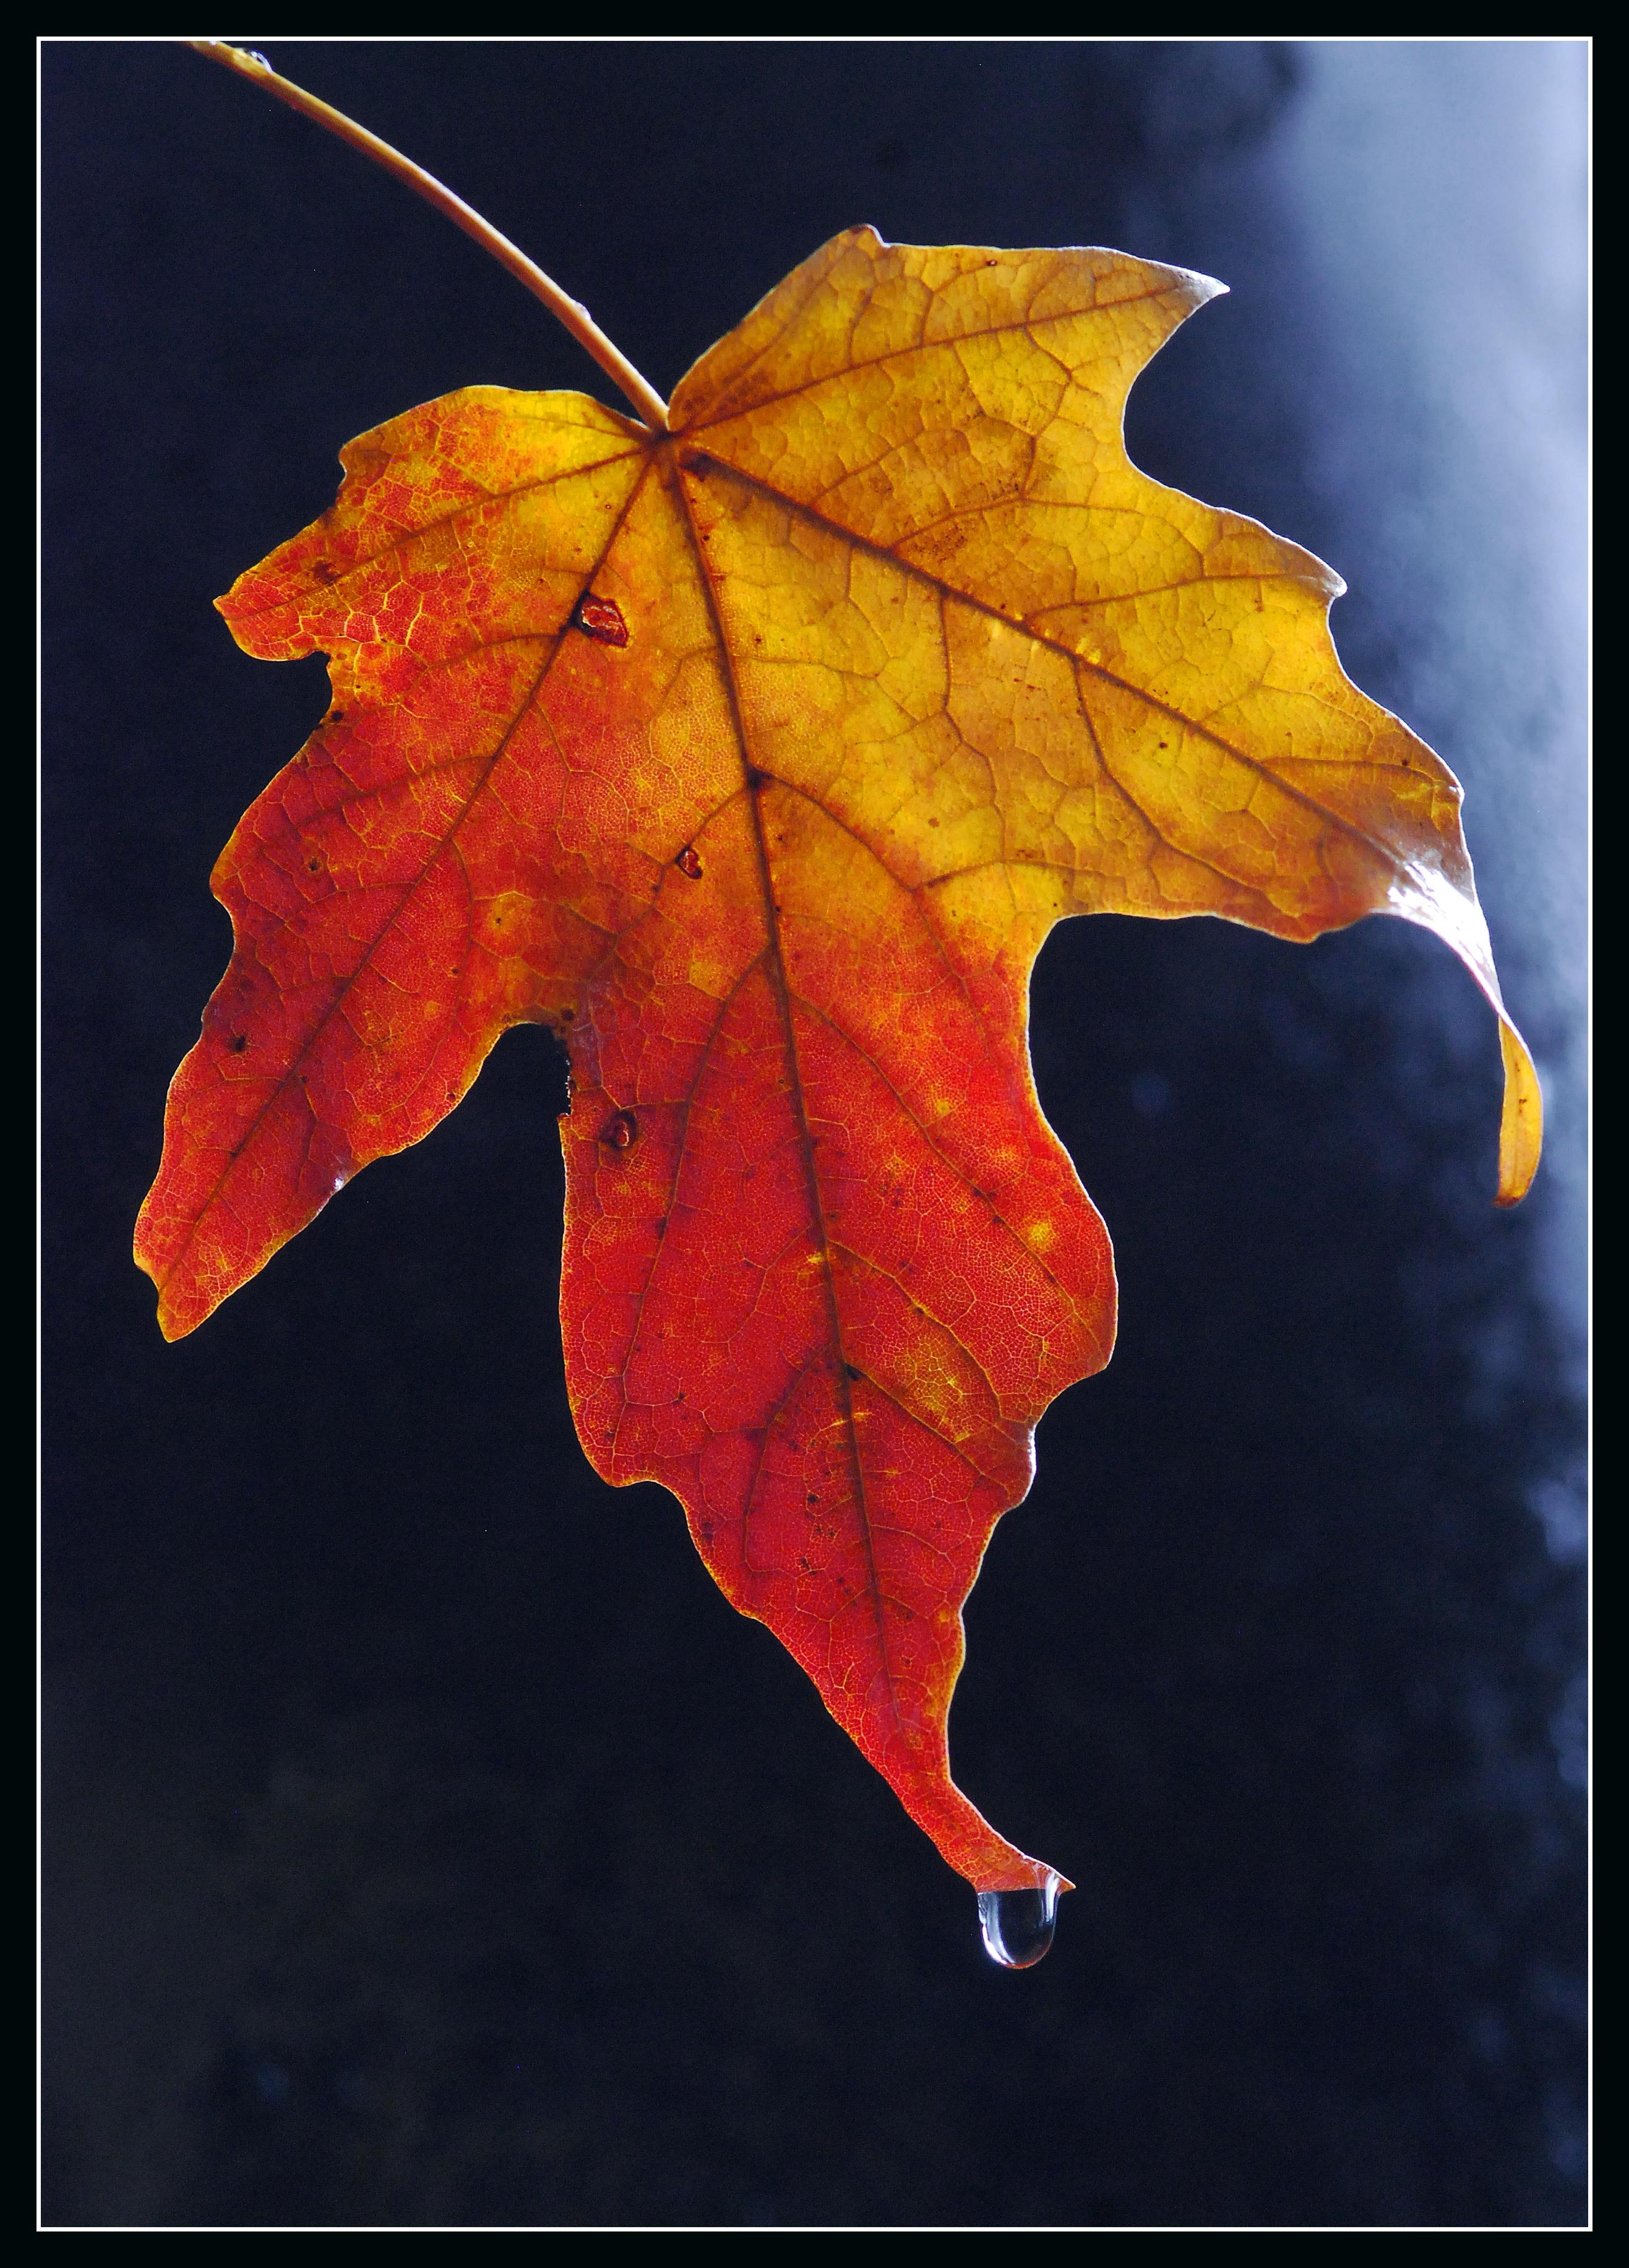 Sugar maple leaf. Photo courtesy of flickr.com user tlindenbaum